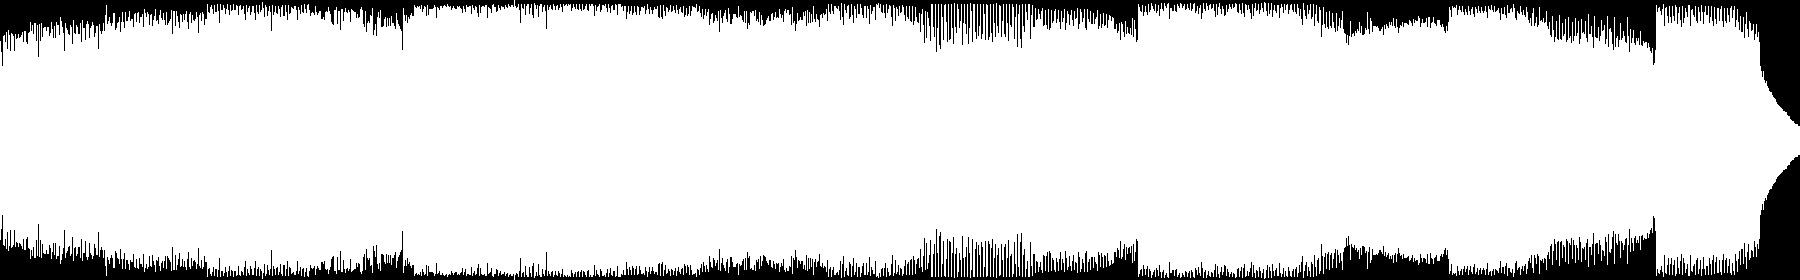 Carbon - Melodic Techno audio waveform